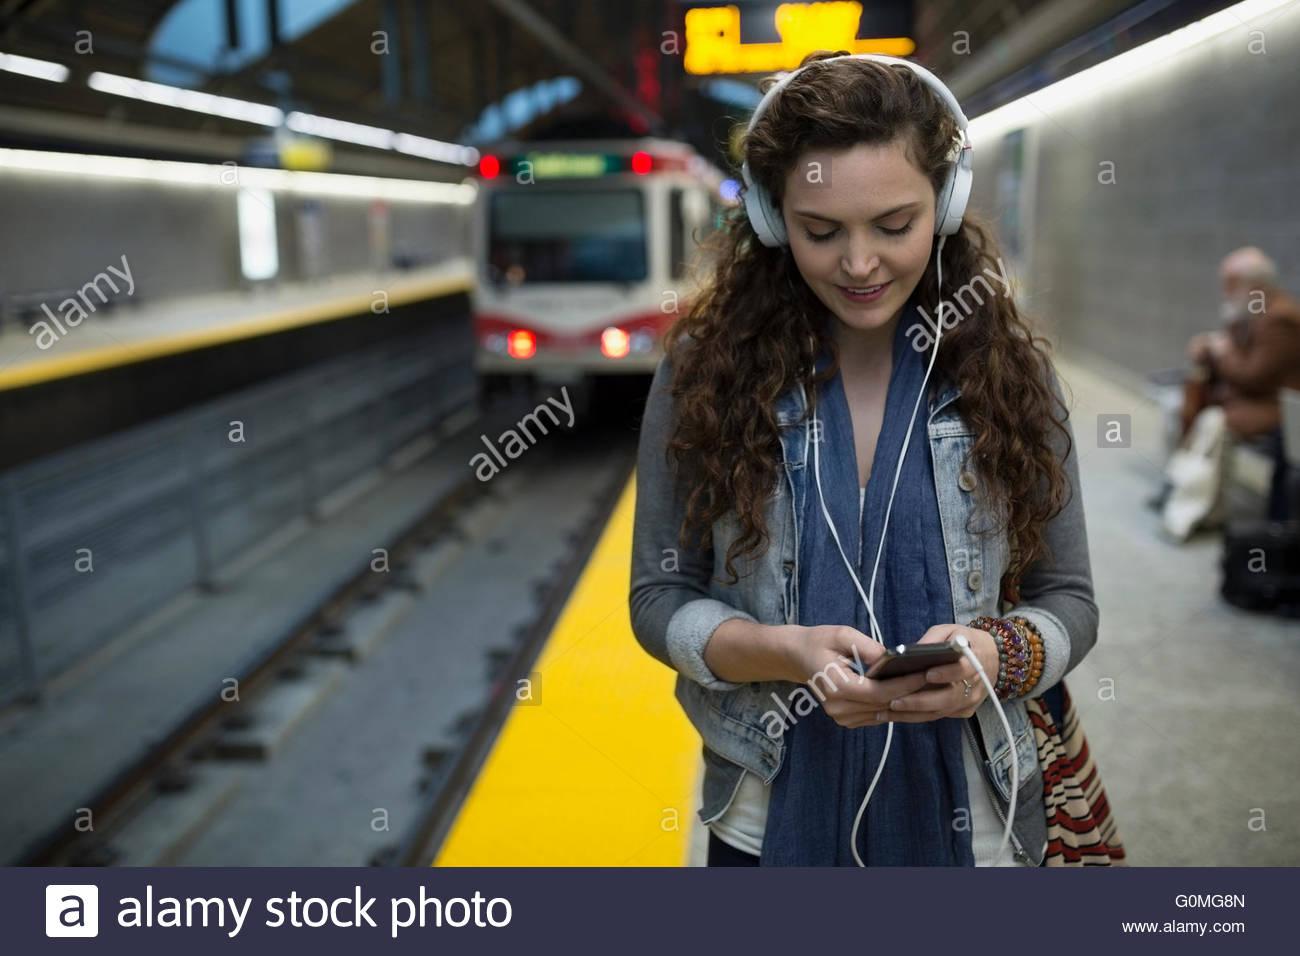 Young woman listening music headphones subway station platform - Stock Image